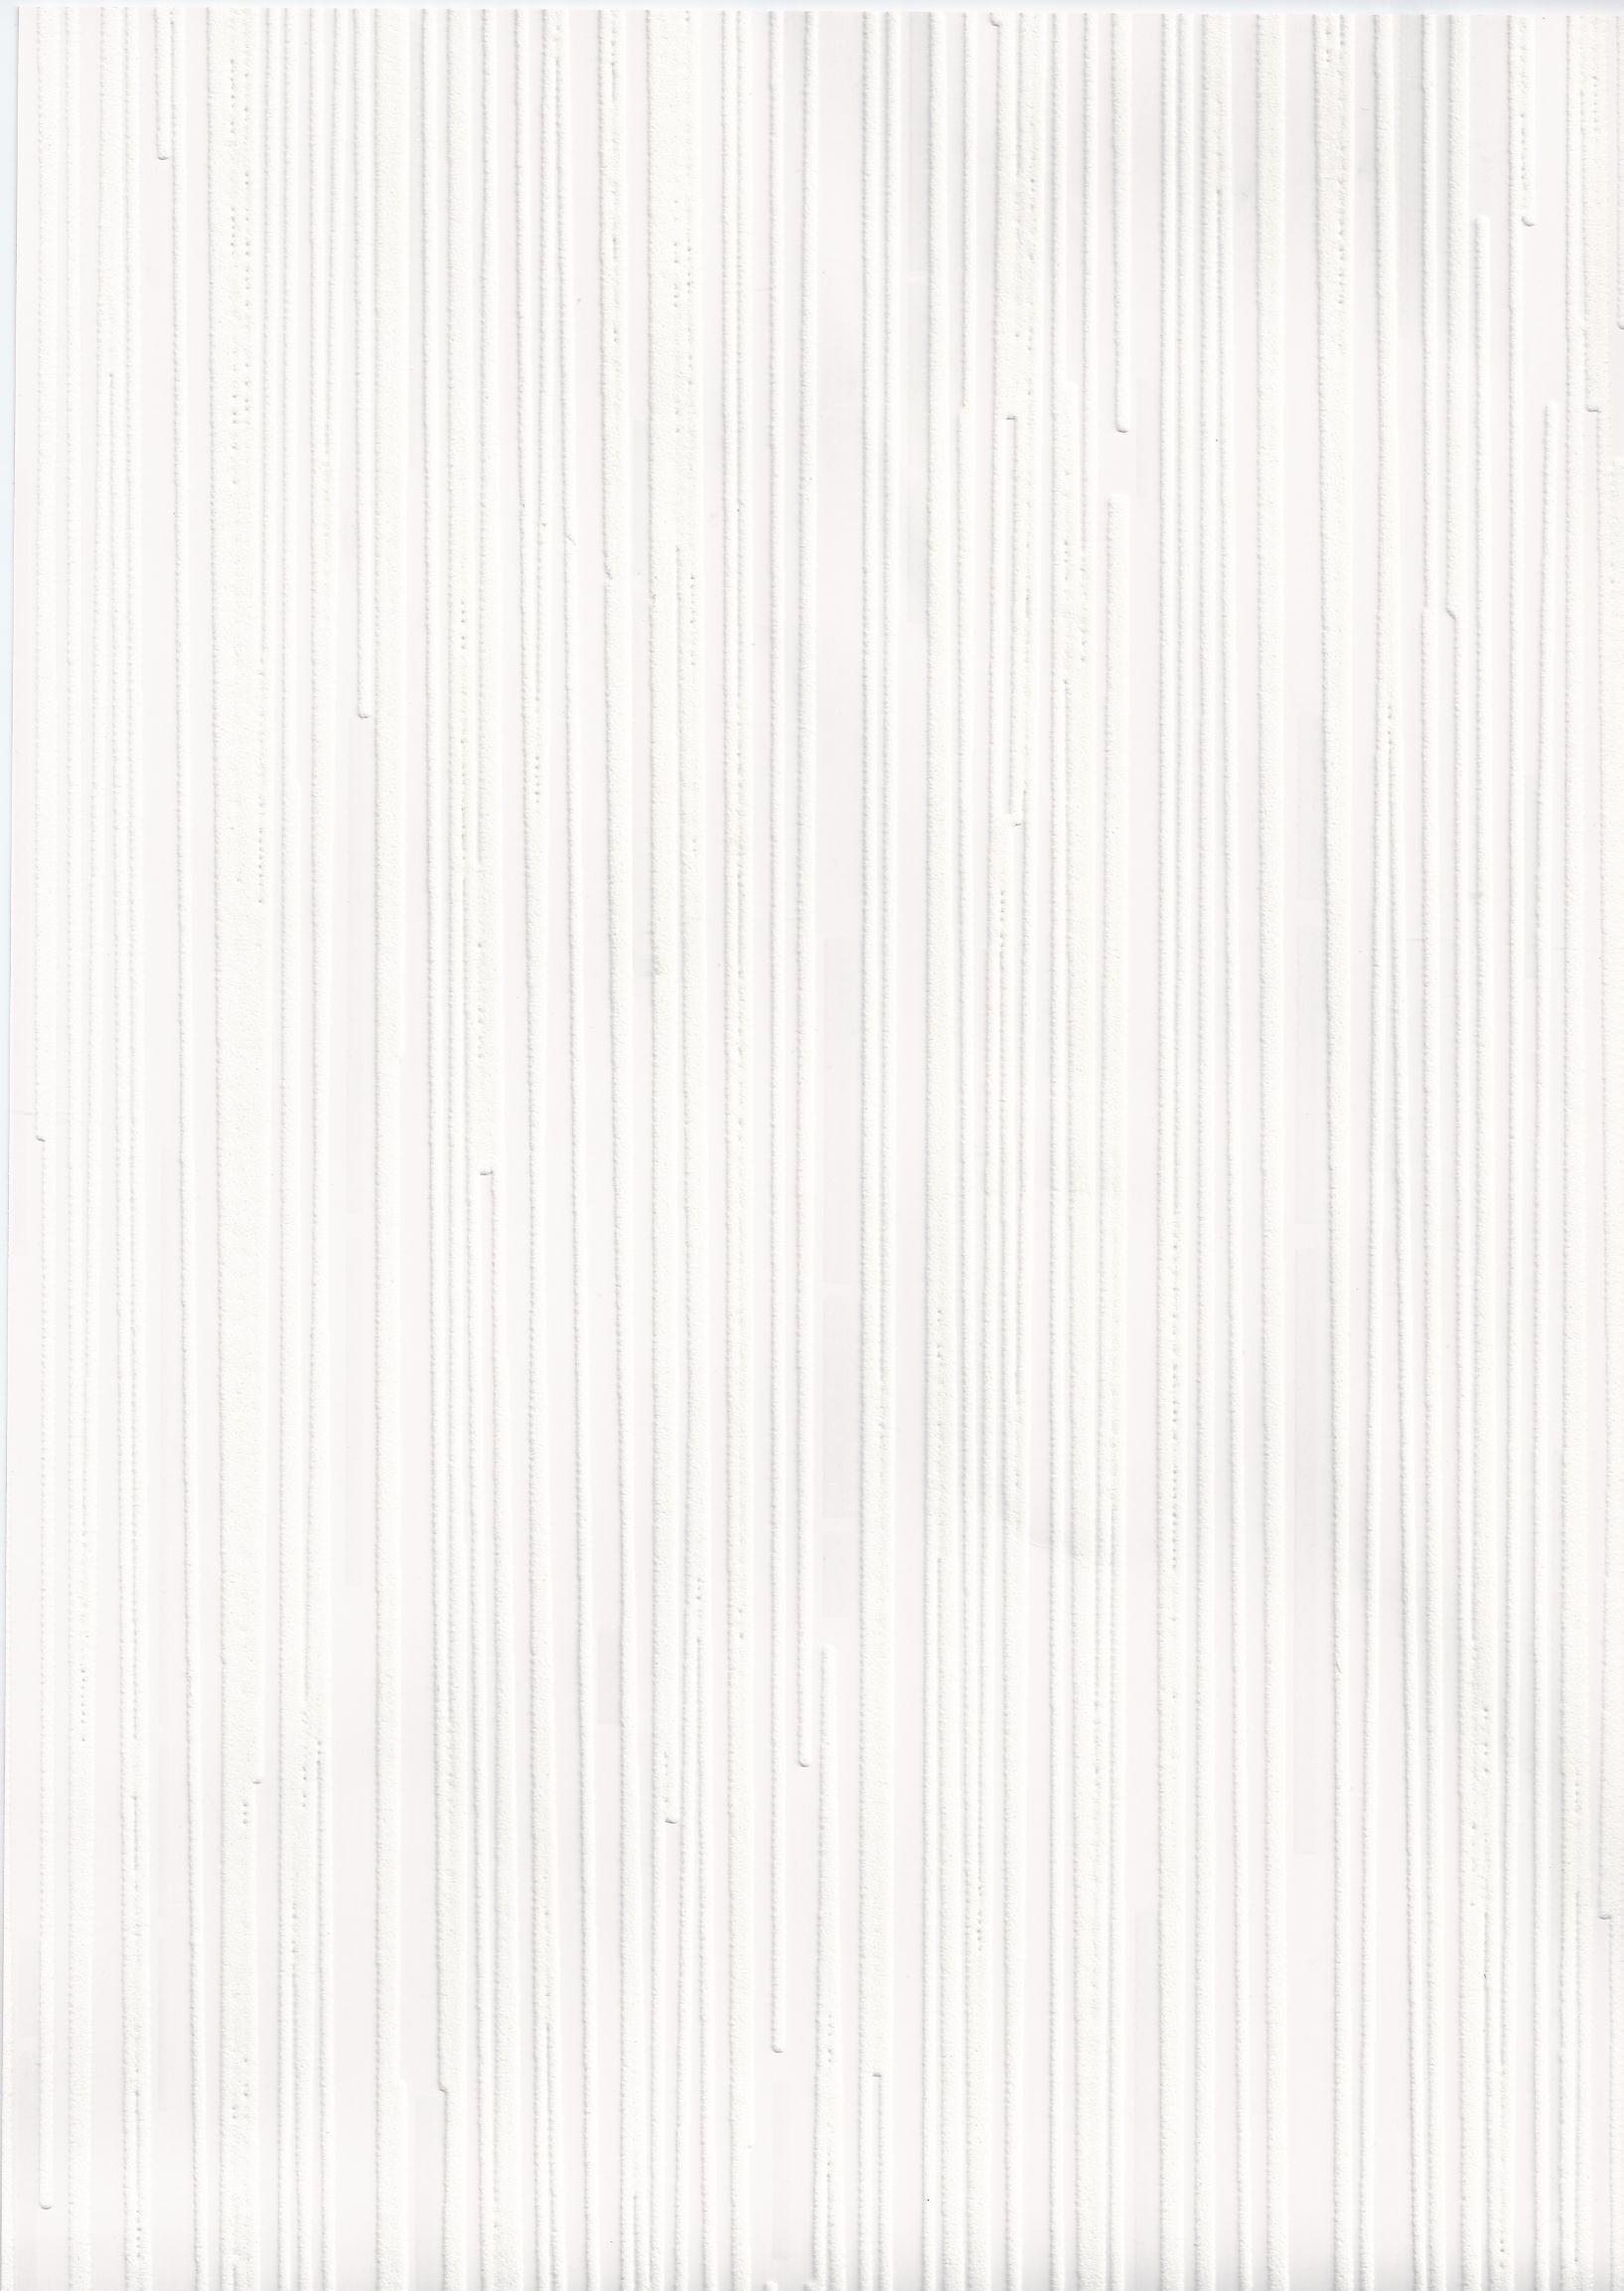 Plain White Wallpaper (51 Wallpapers)